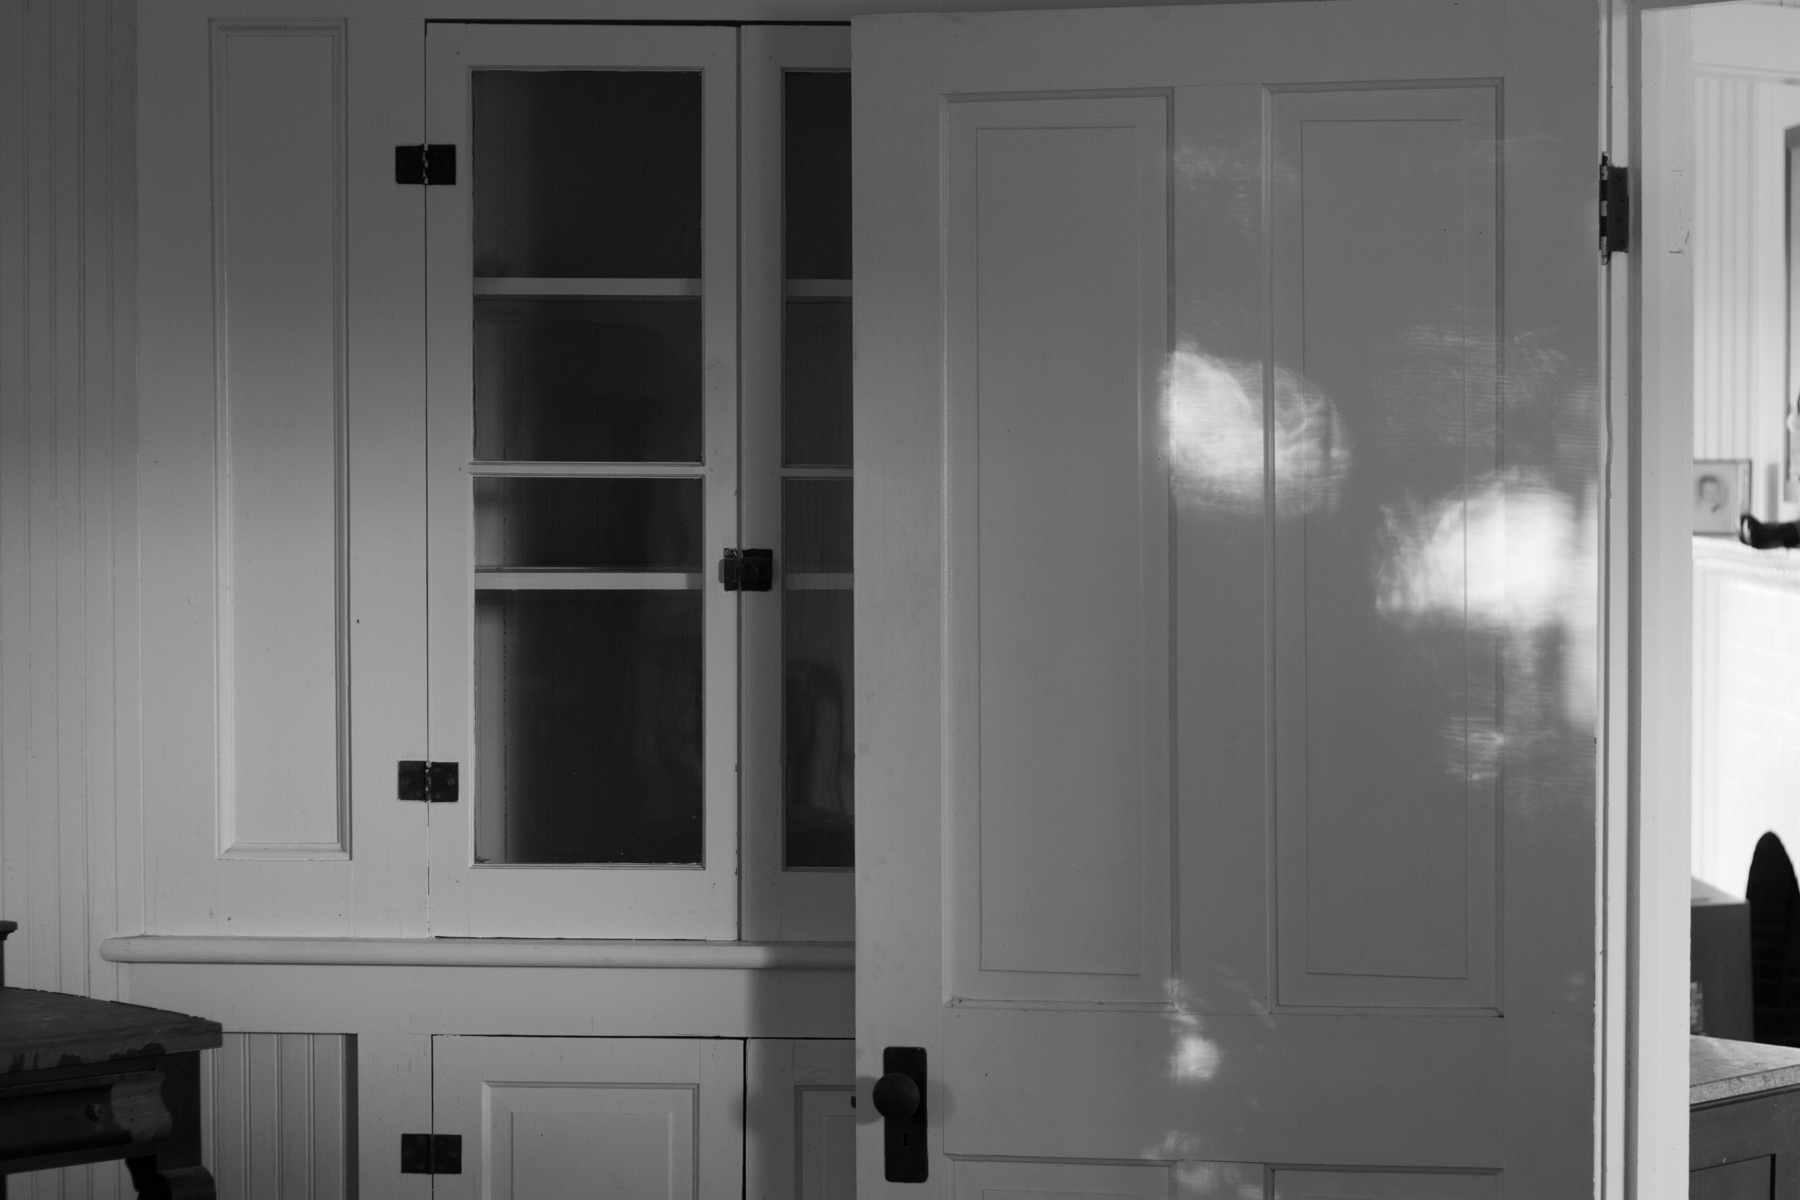 Shadows-6.jpg